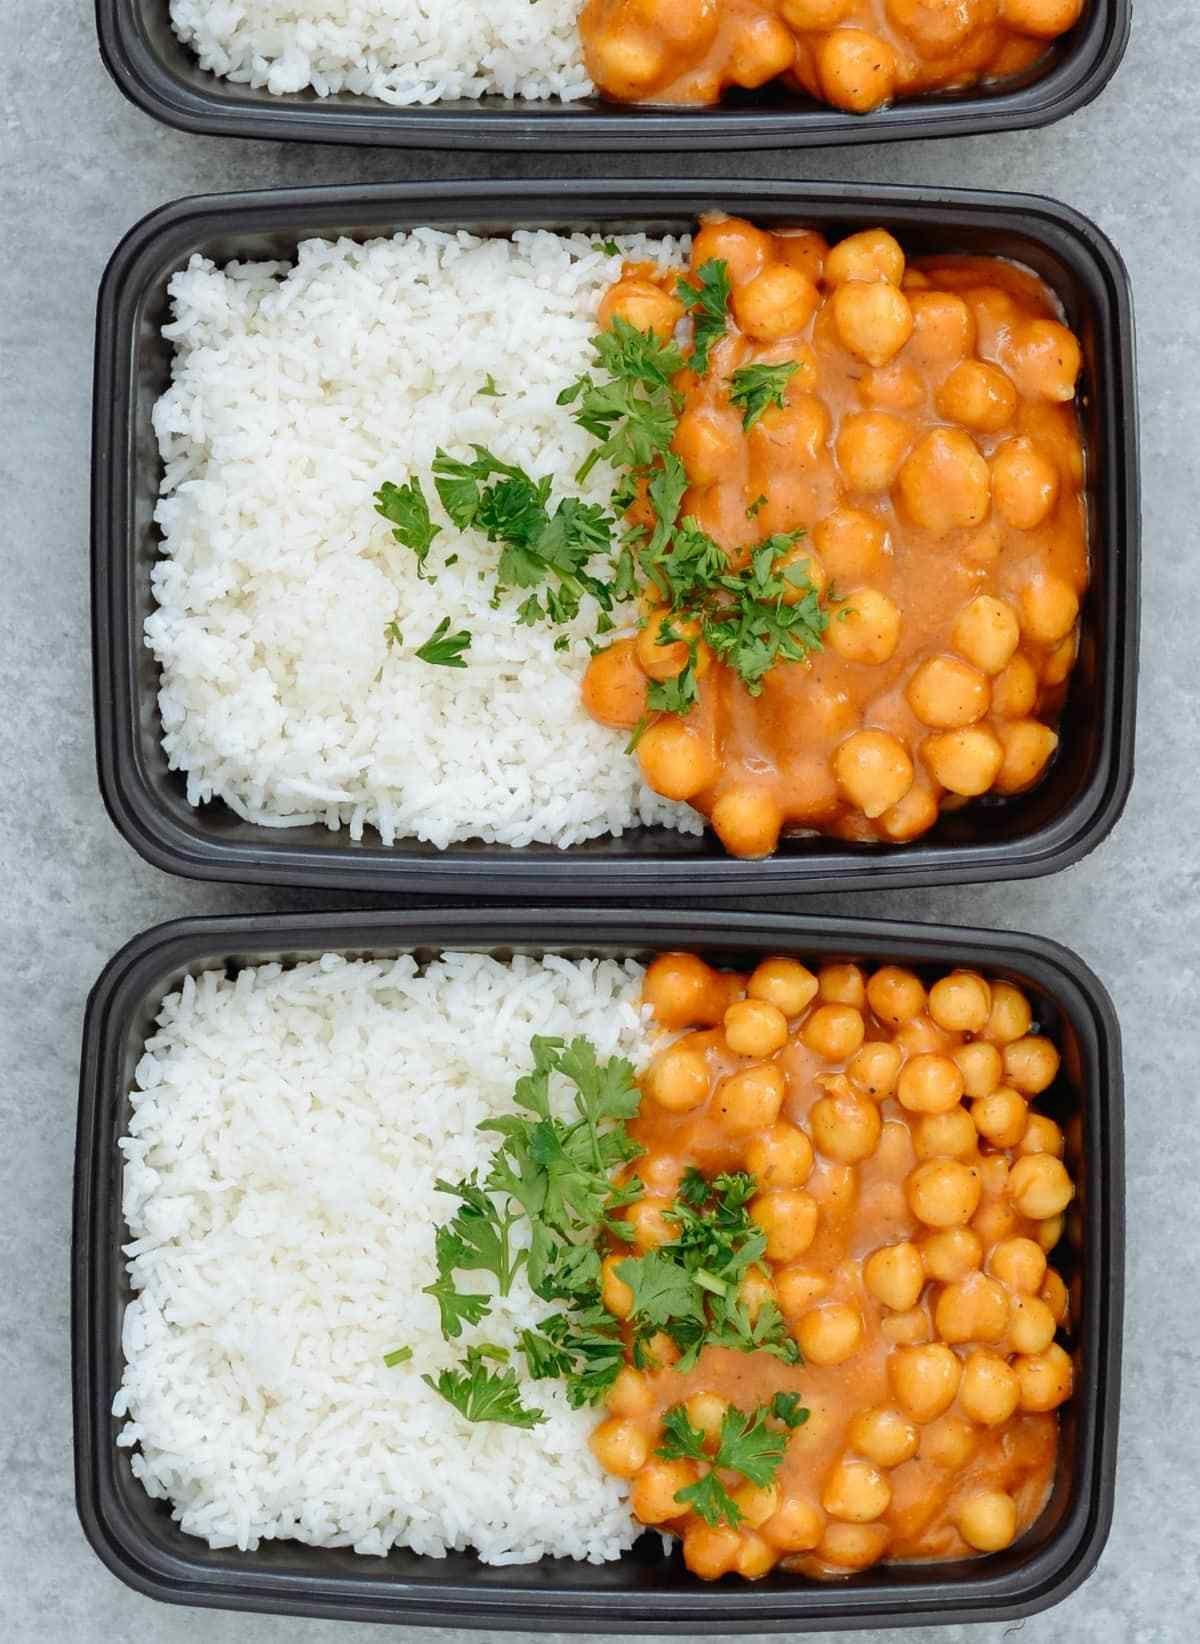 Vegan Chickpea Curry Basmati Rice Meal Prep Meal Prep On Fleek Recipe Vegan Chickpea Curry Whole Food Recipes Vegetarian Meal Prep